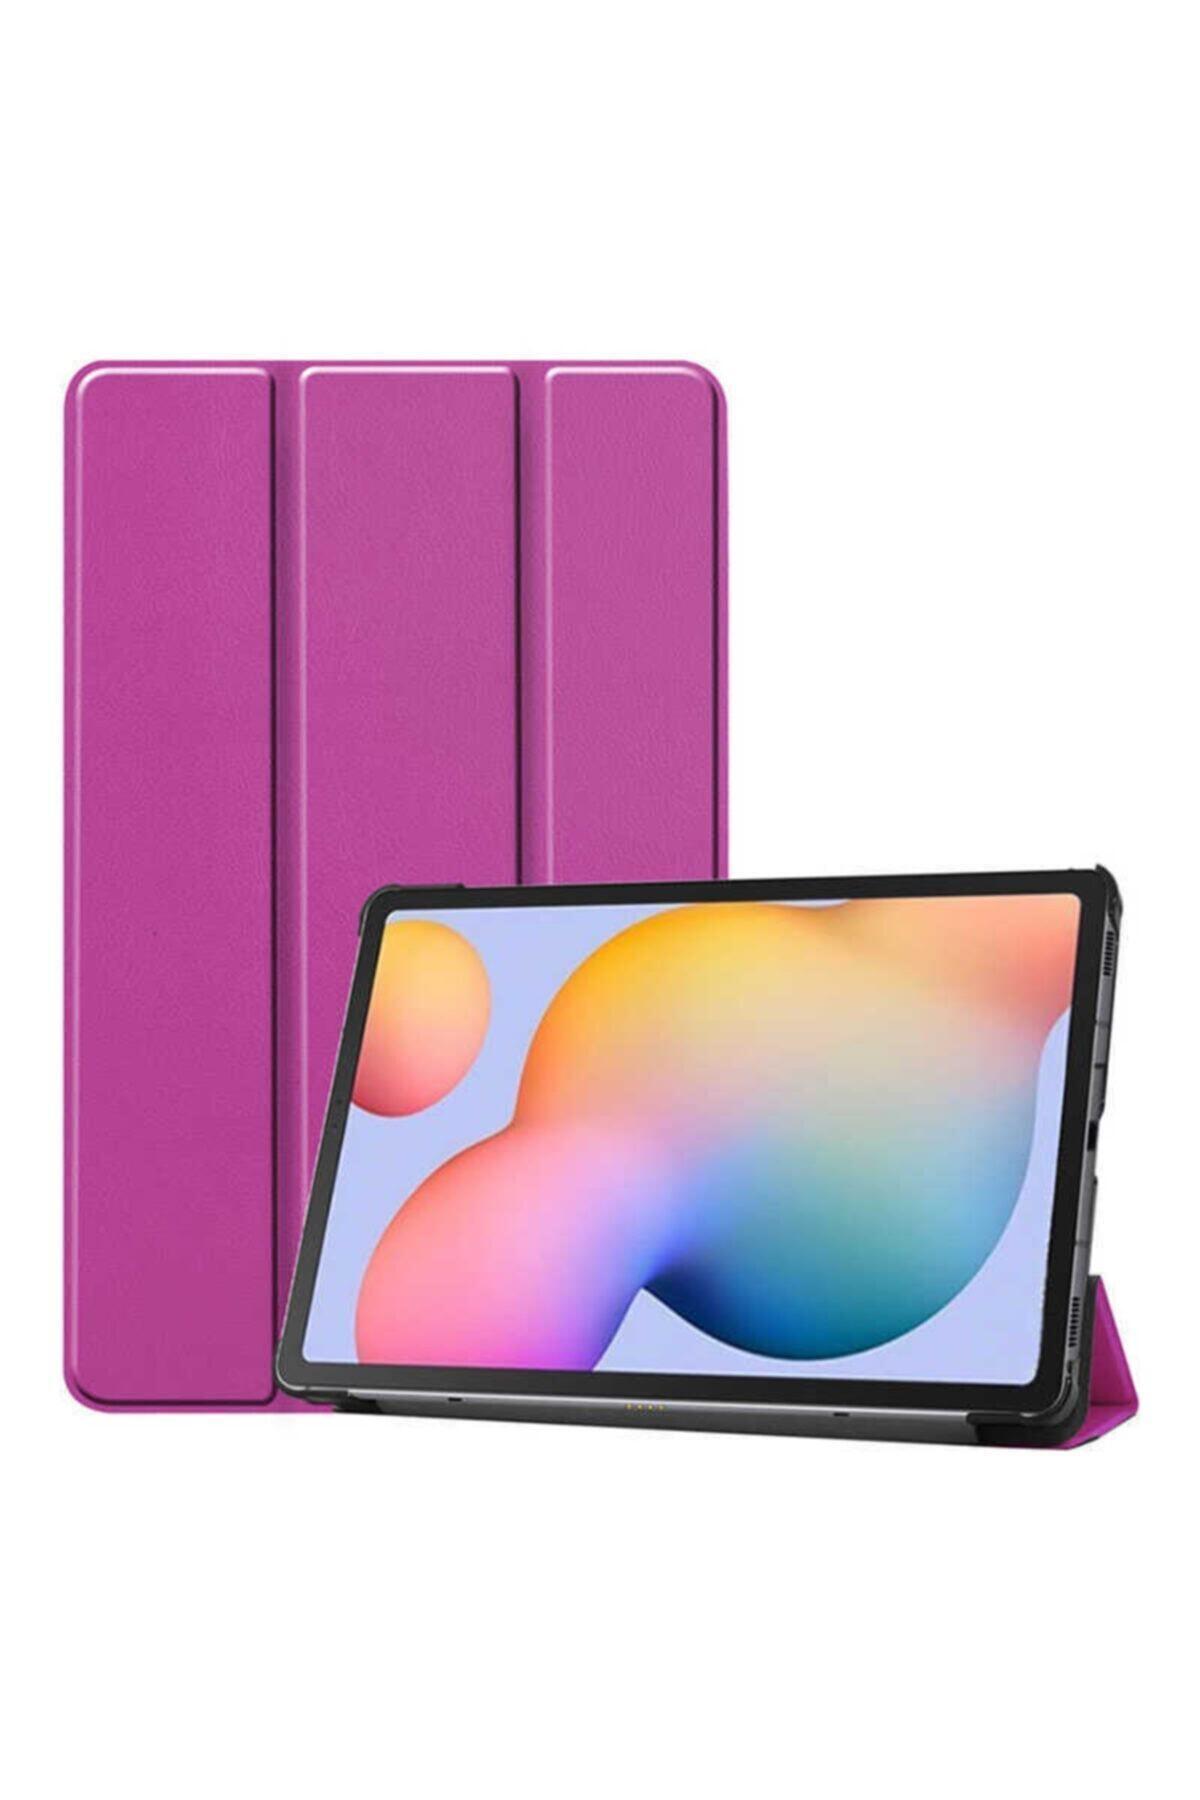 zore Samsung Galaxy Tab A7 10.4 (2020) Sm-t500 Uyku Modlu Mıknatıslı Kapak Smart Kılıf 1